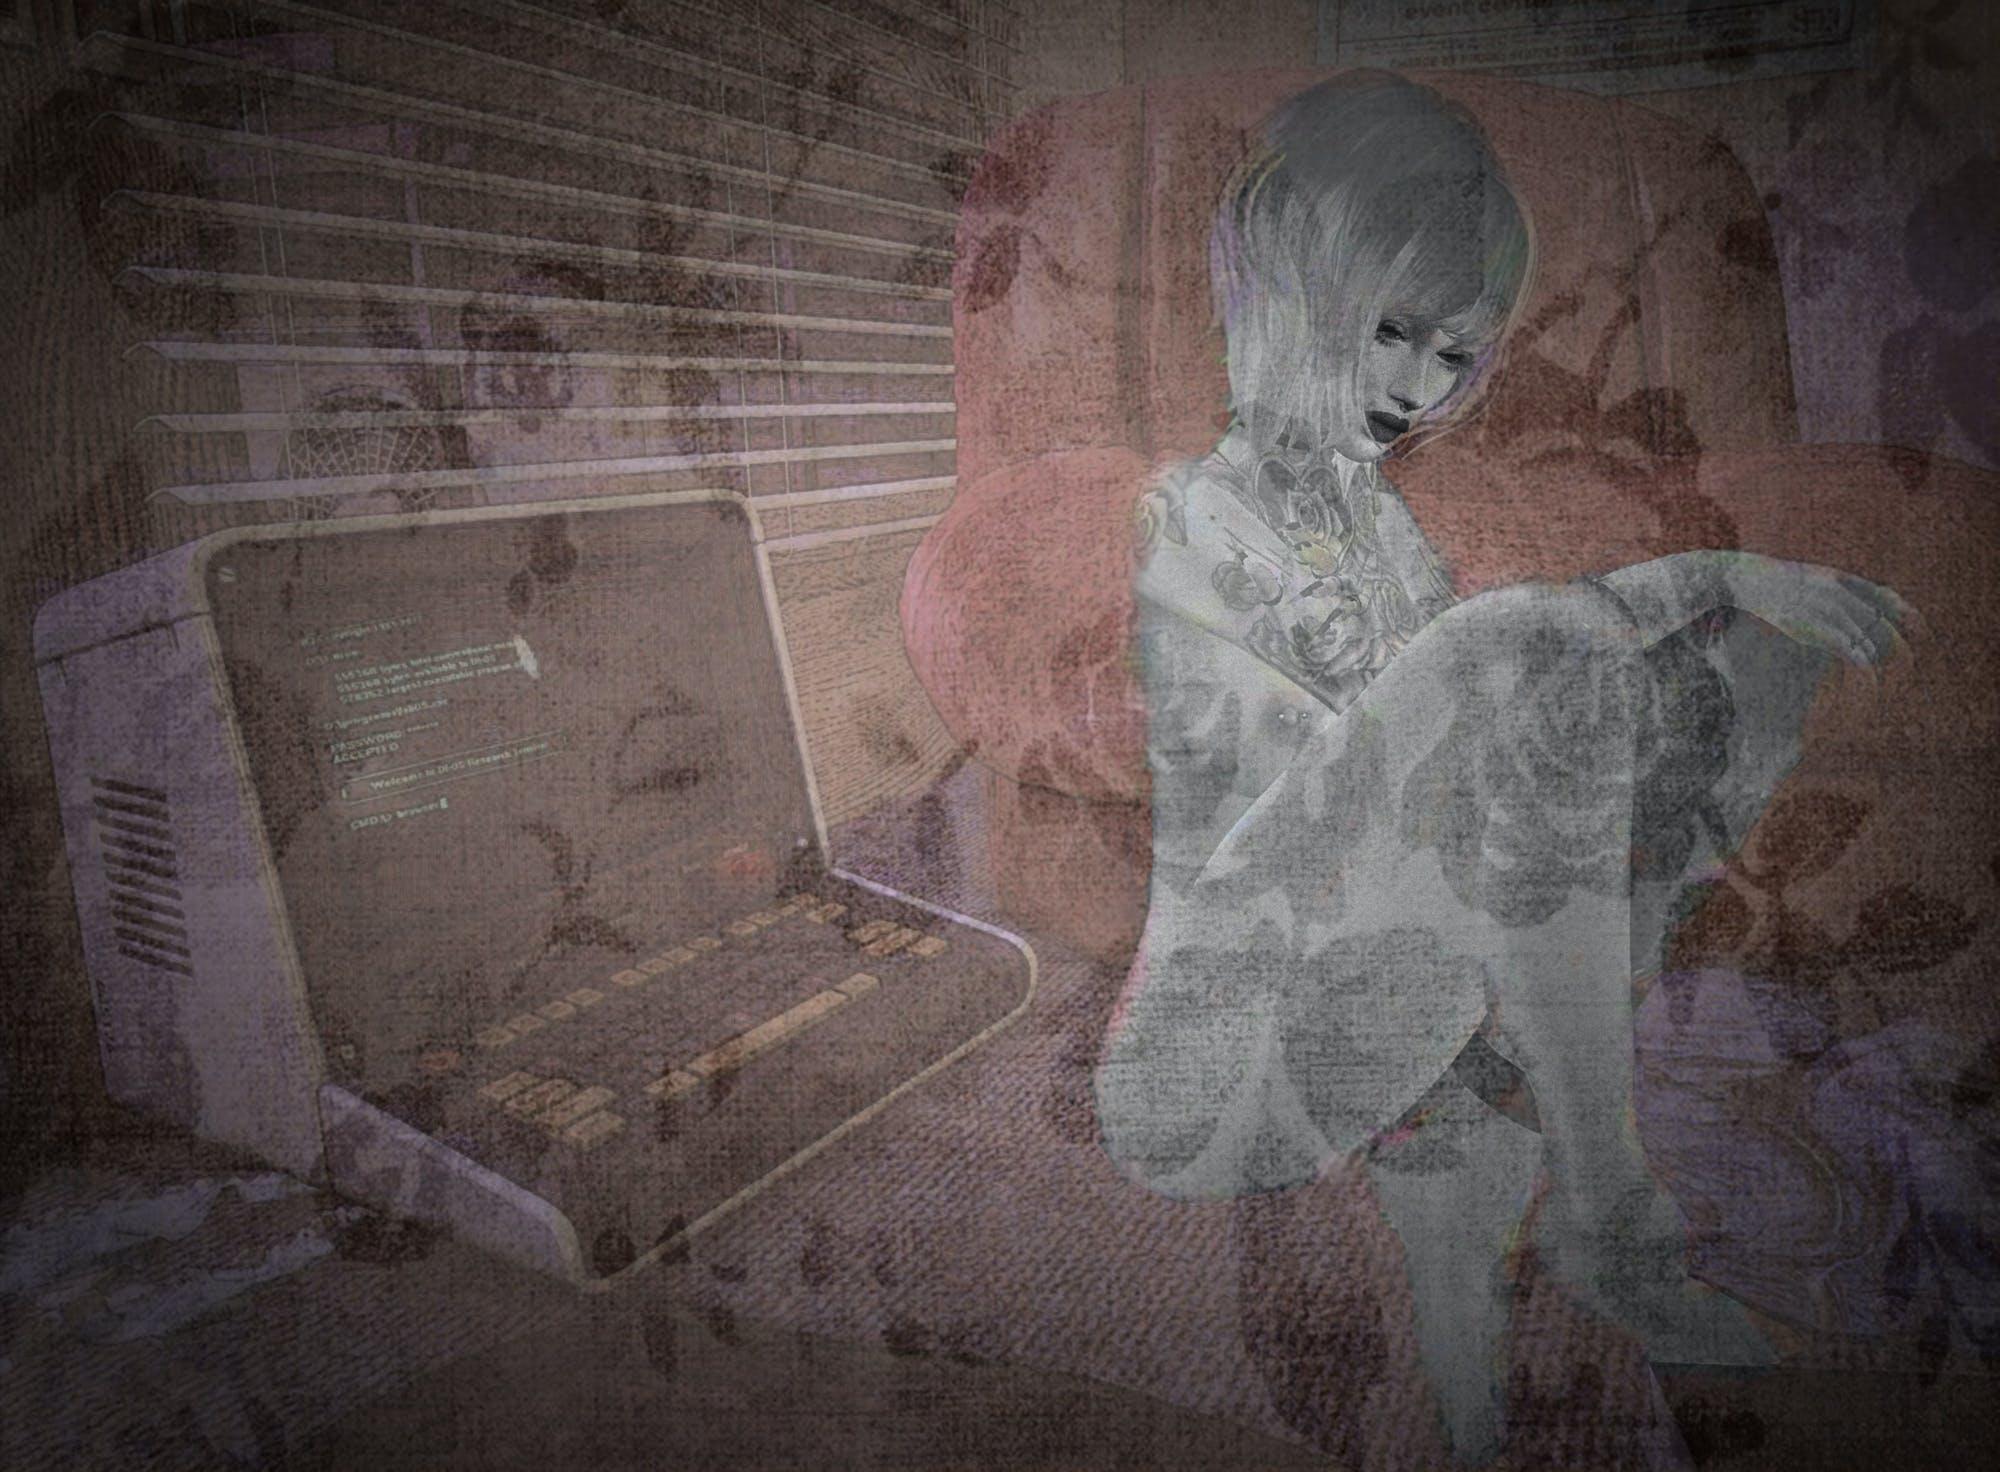 nude, technology, woman